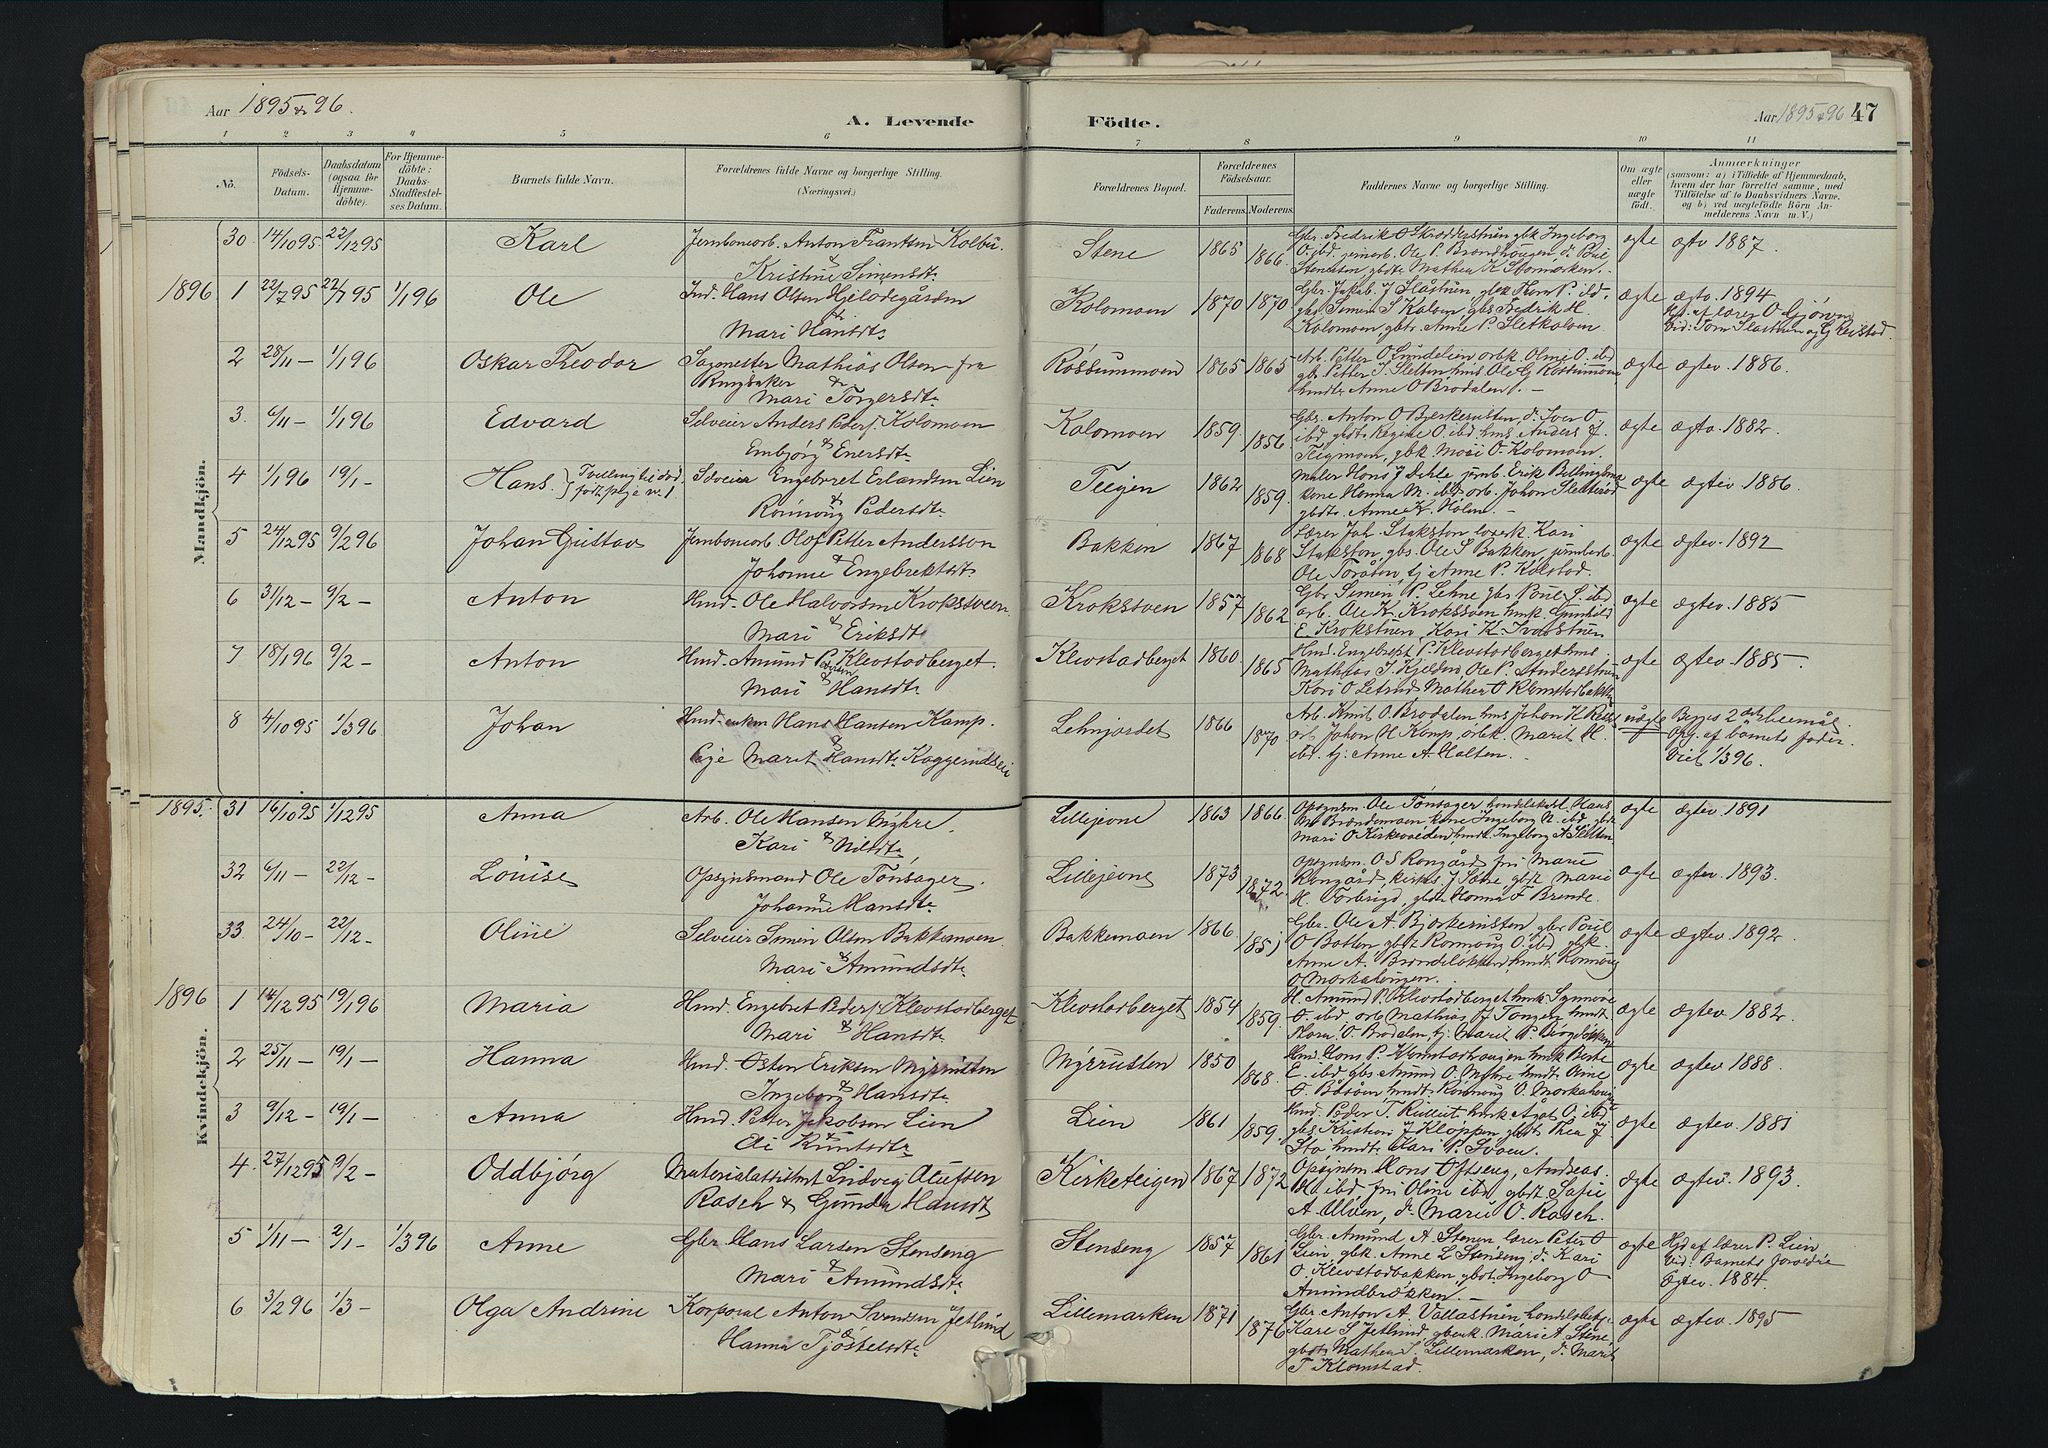 SAH, Nord-Fron prestekontor, Ministerialbok nr. 3, 1884-1914, s. 47